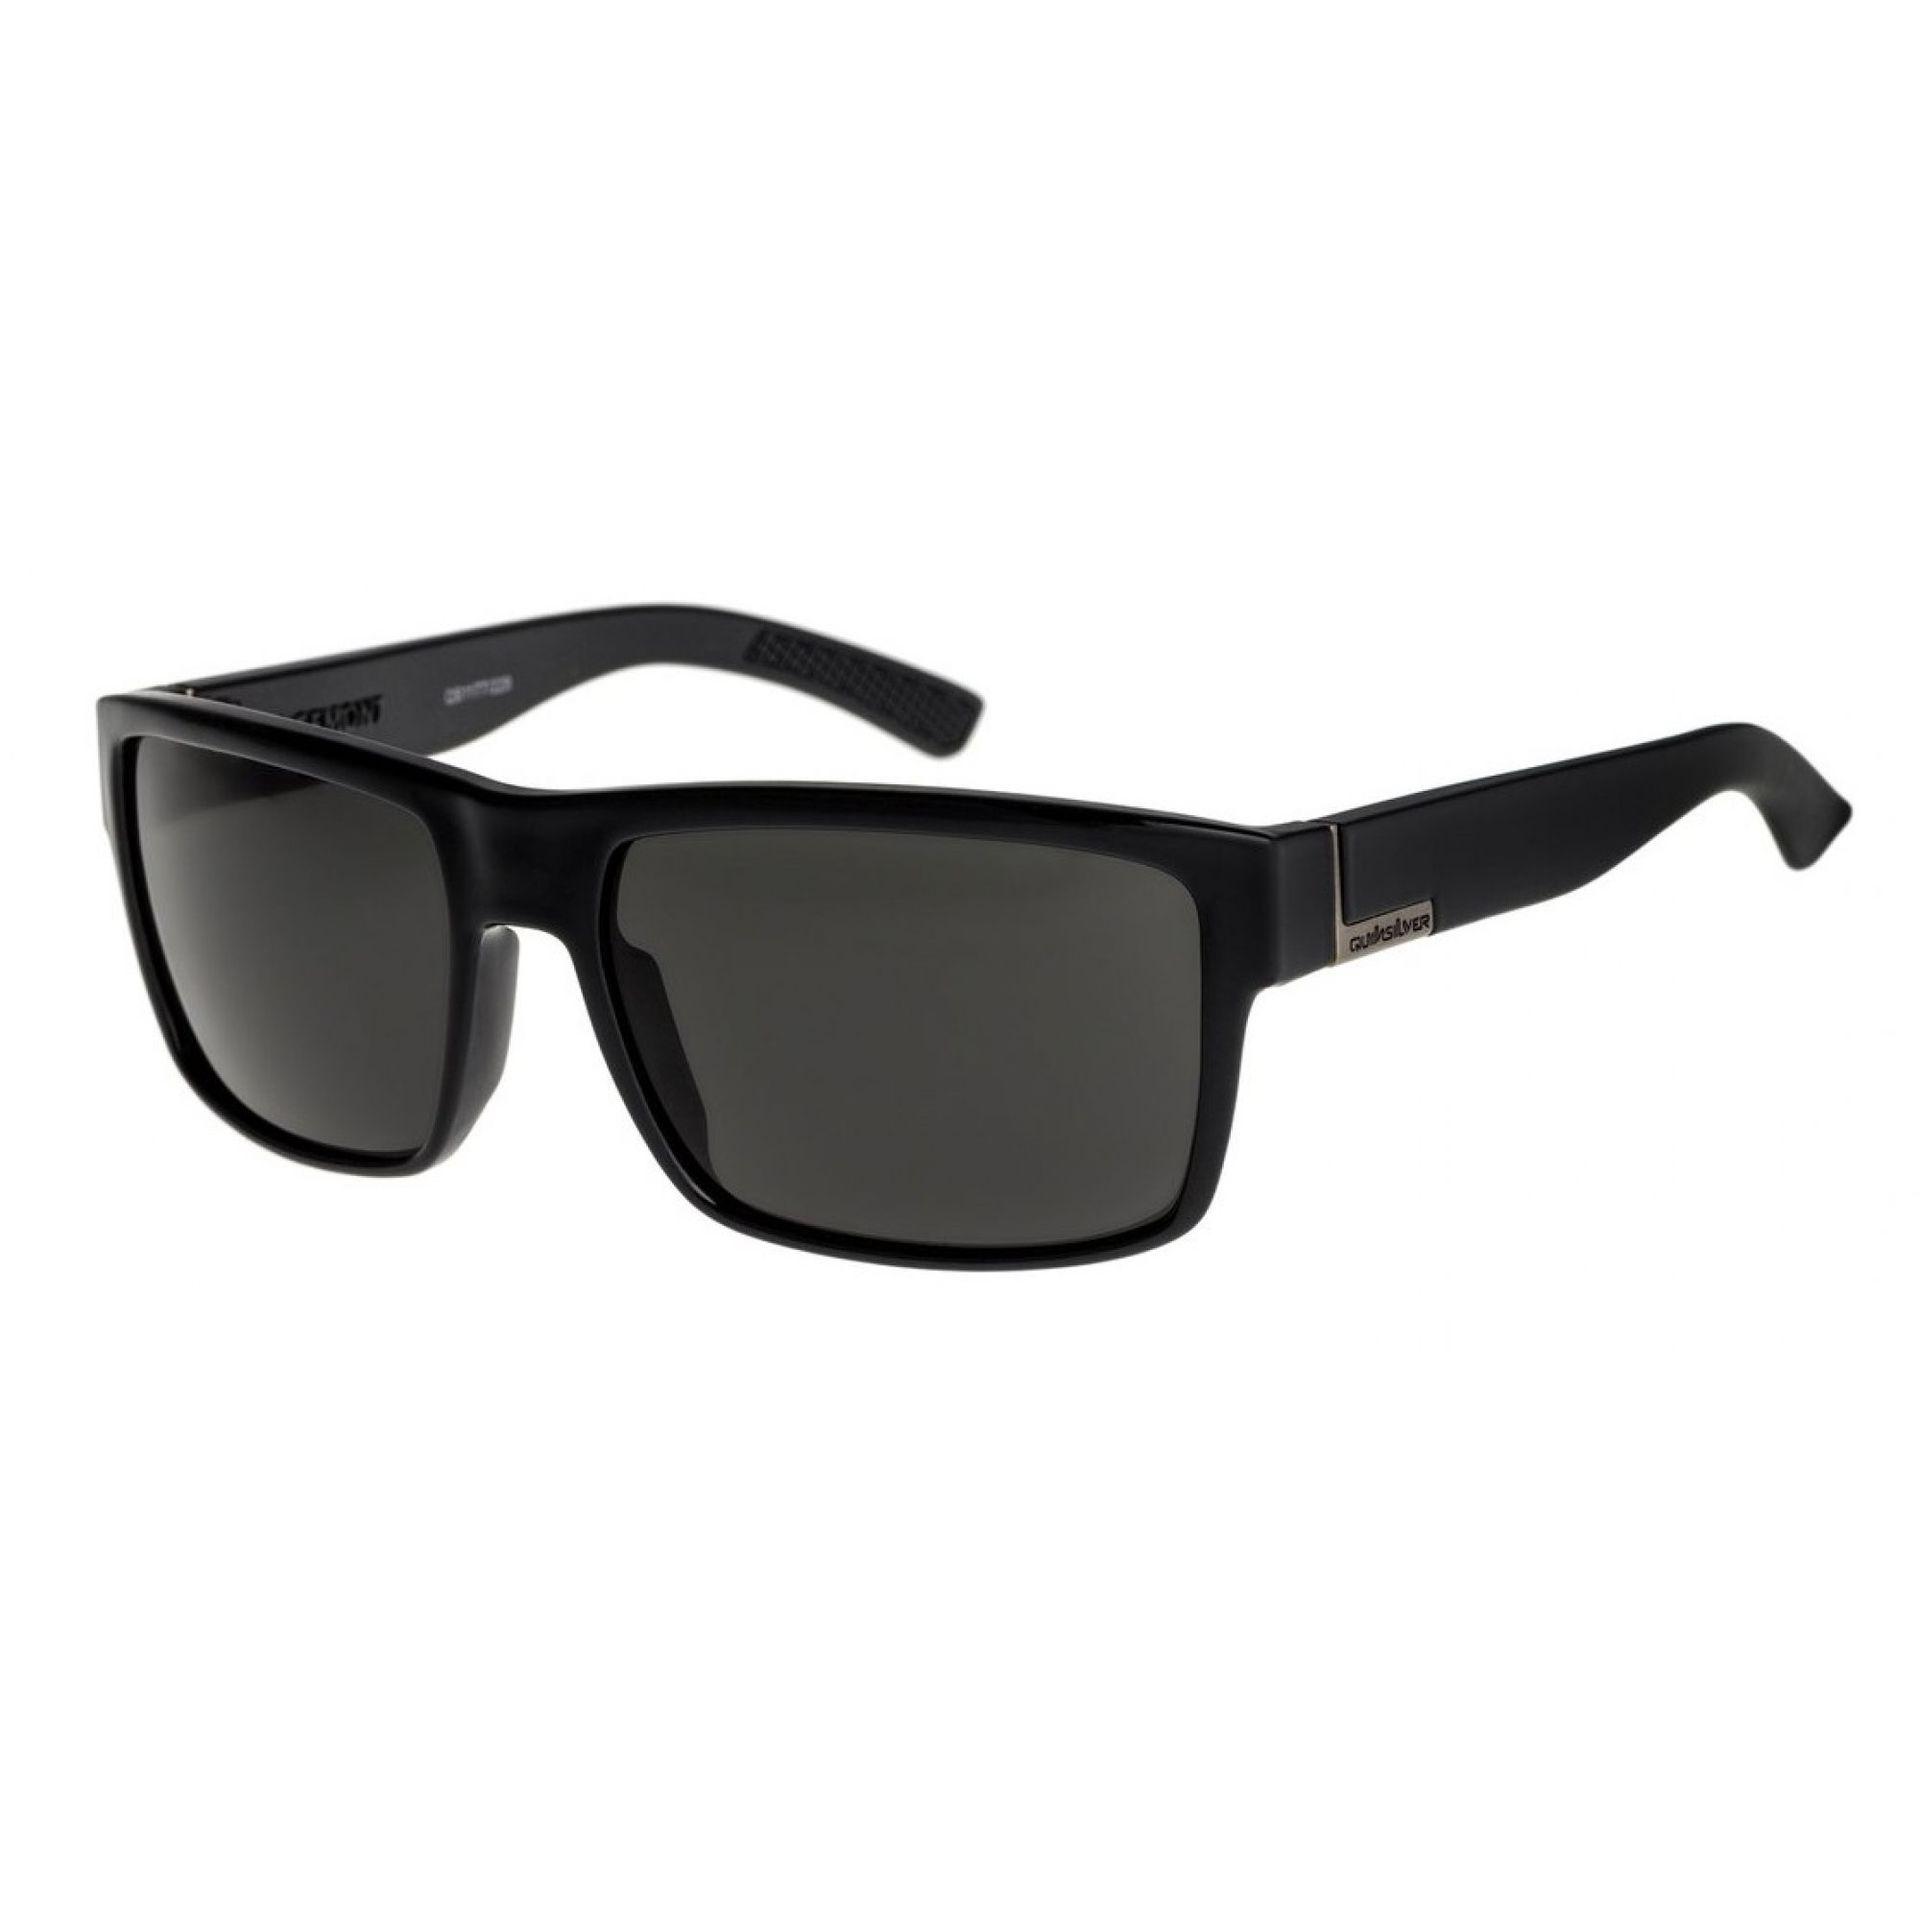 Okulary Quiksilver Ridgemont czarne